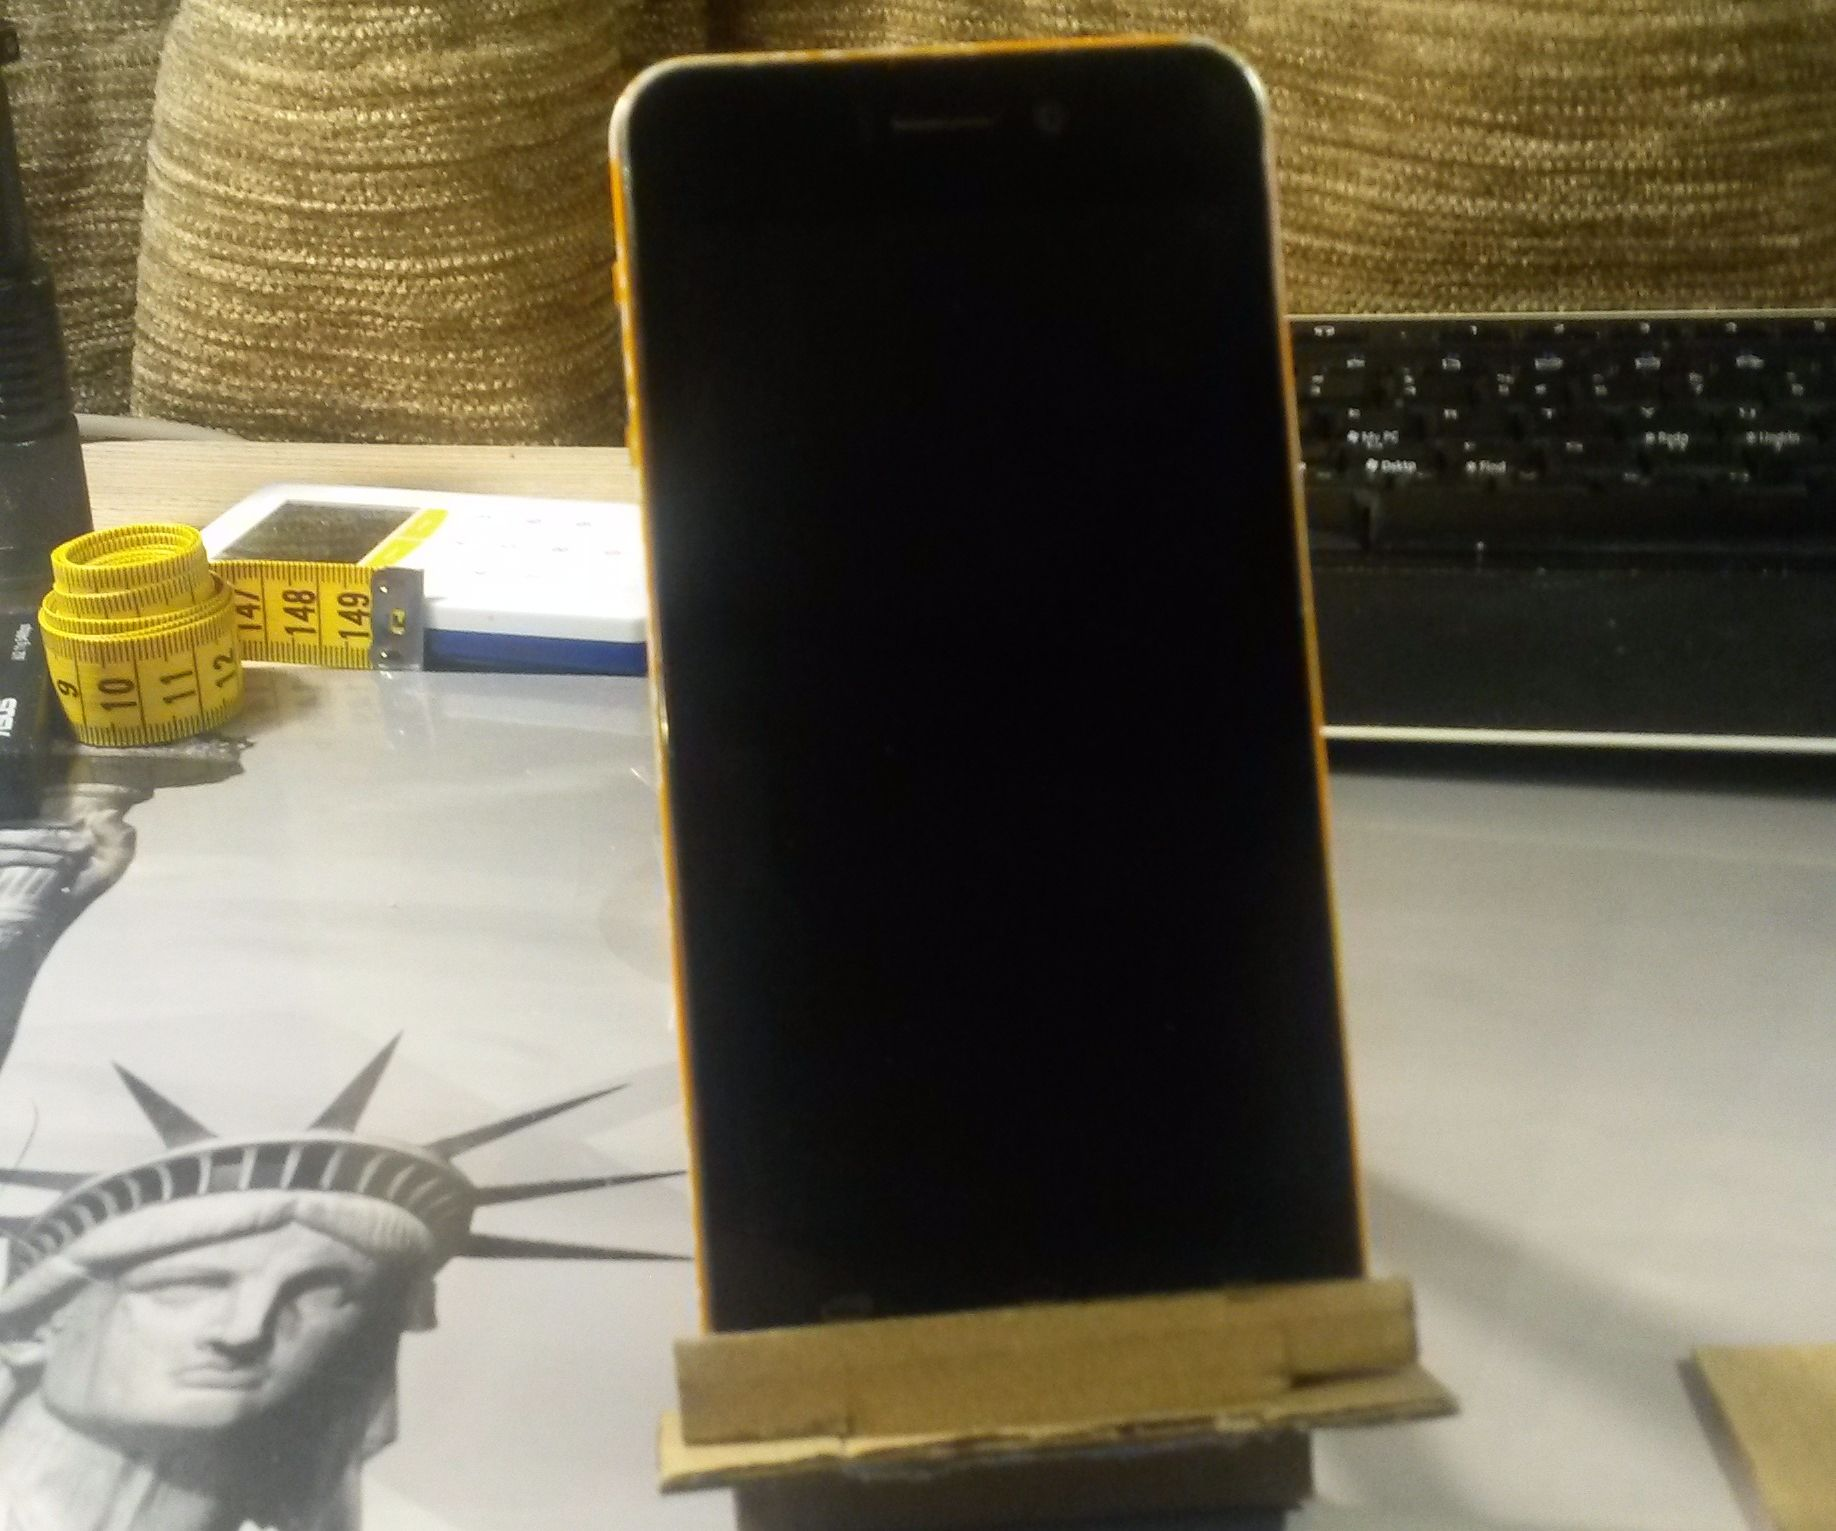 Cardboard-only phone holder